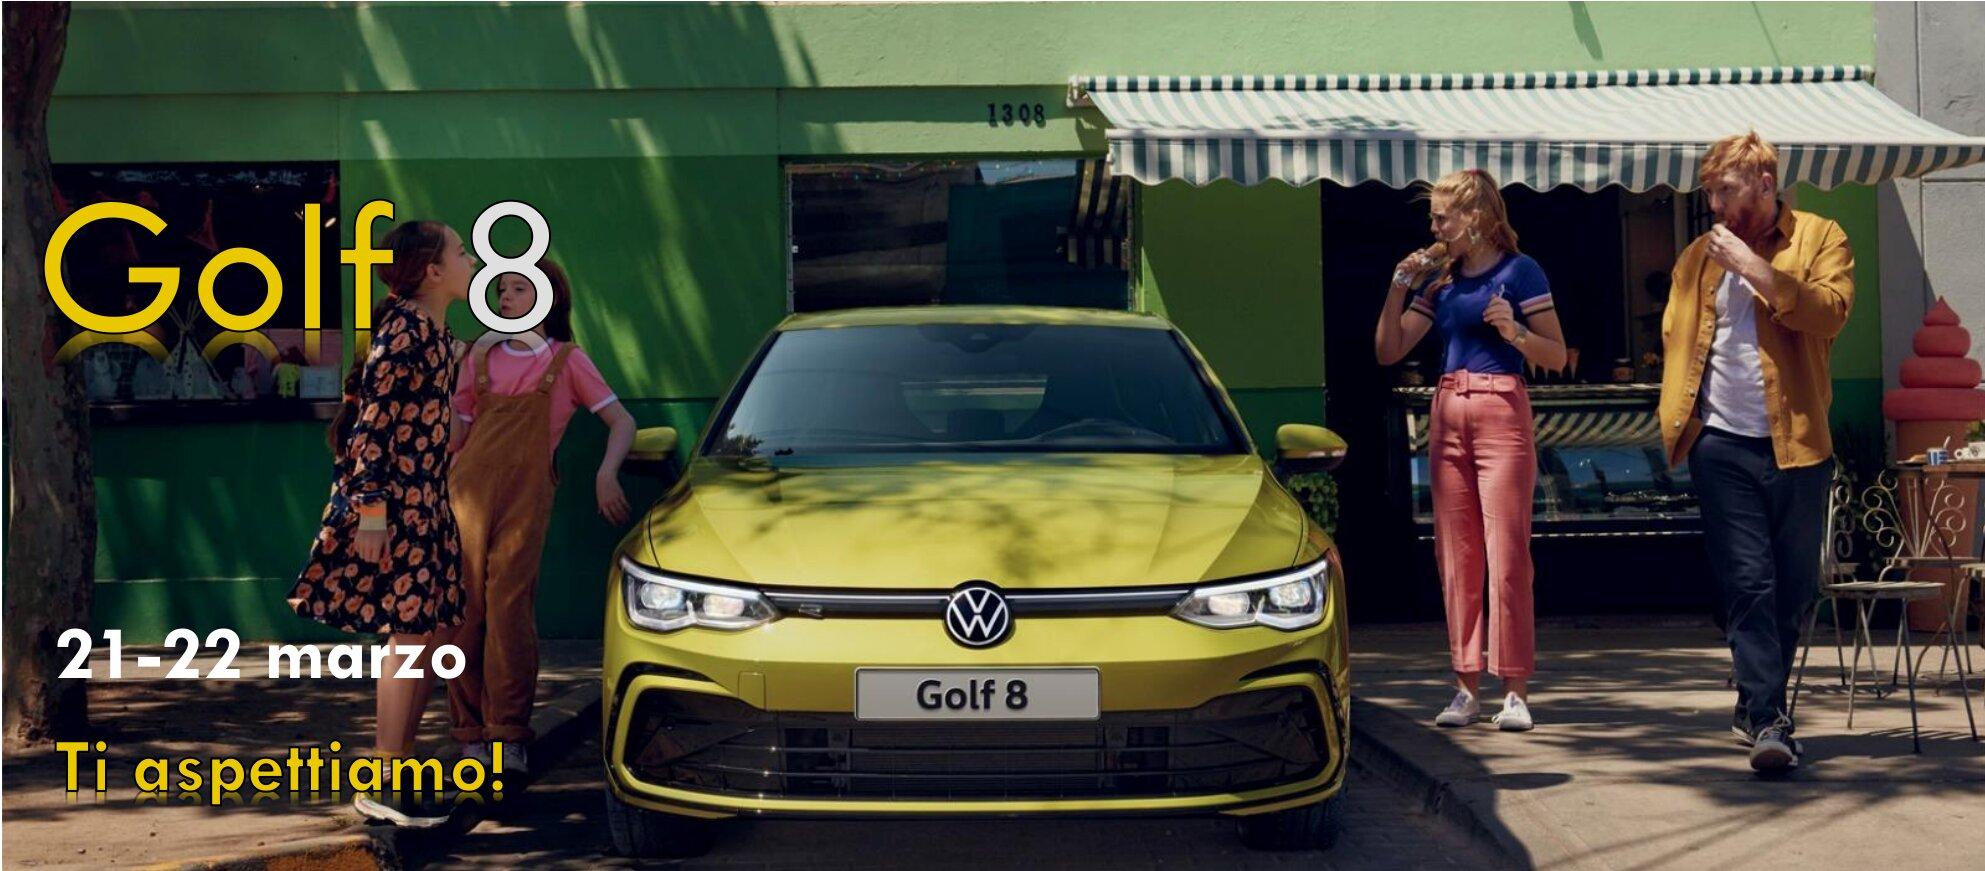 Presentazione Golf 8